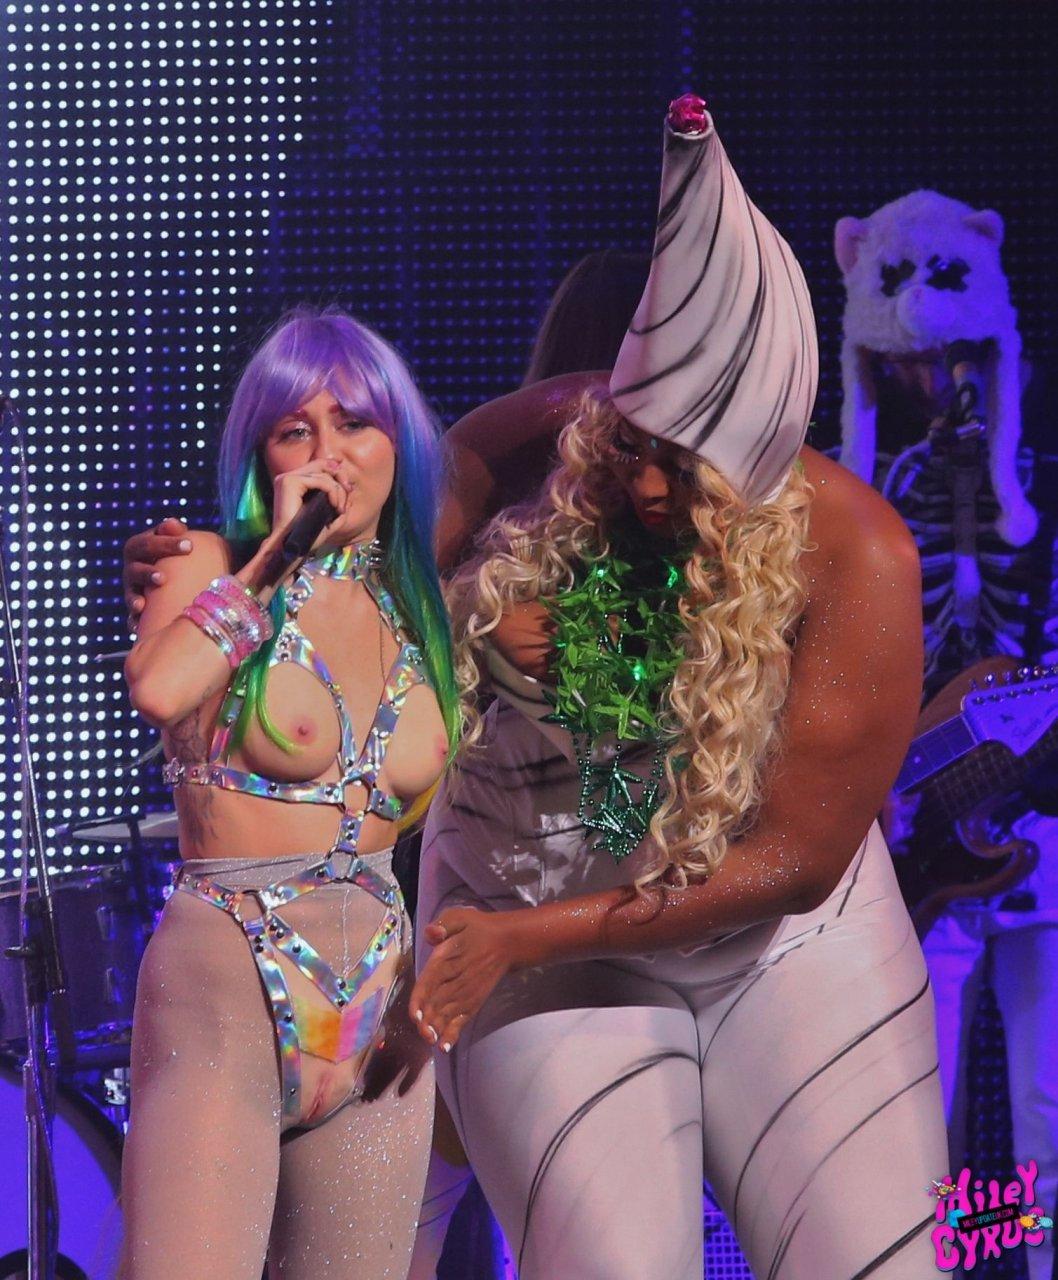 Miley cyrus strapon